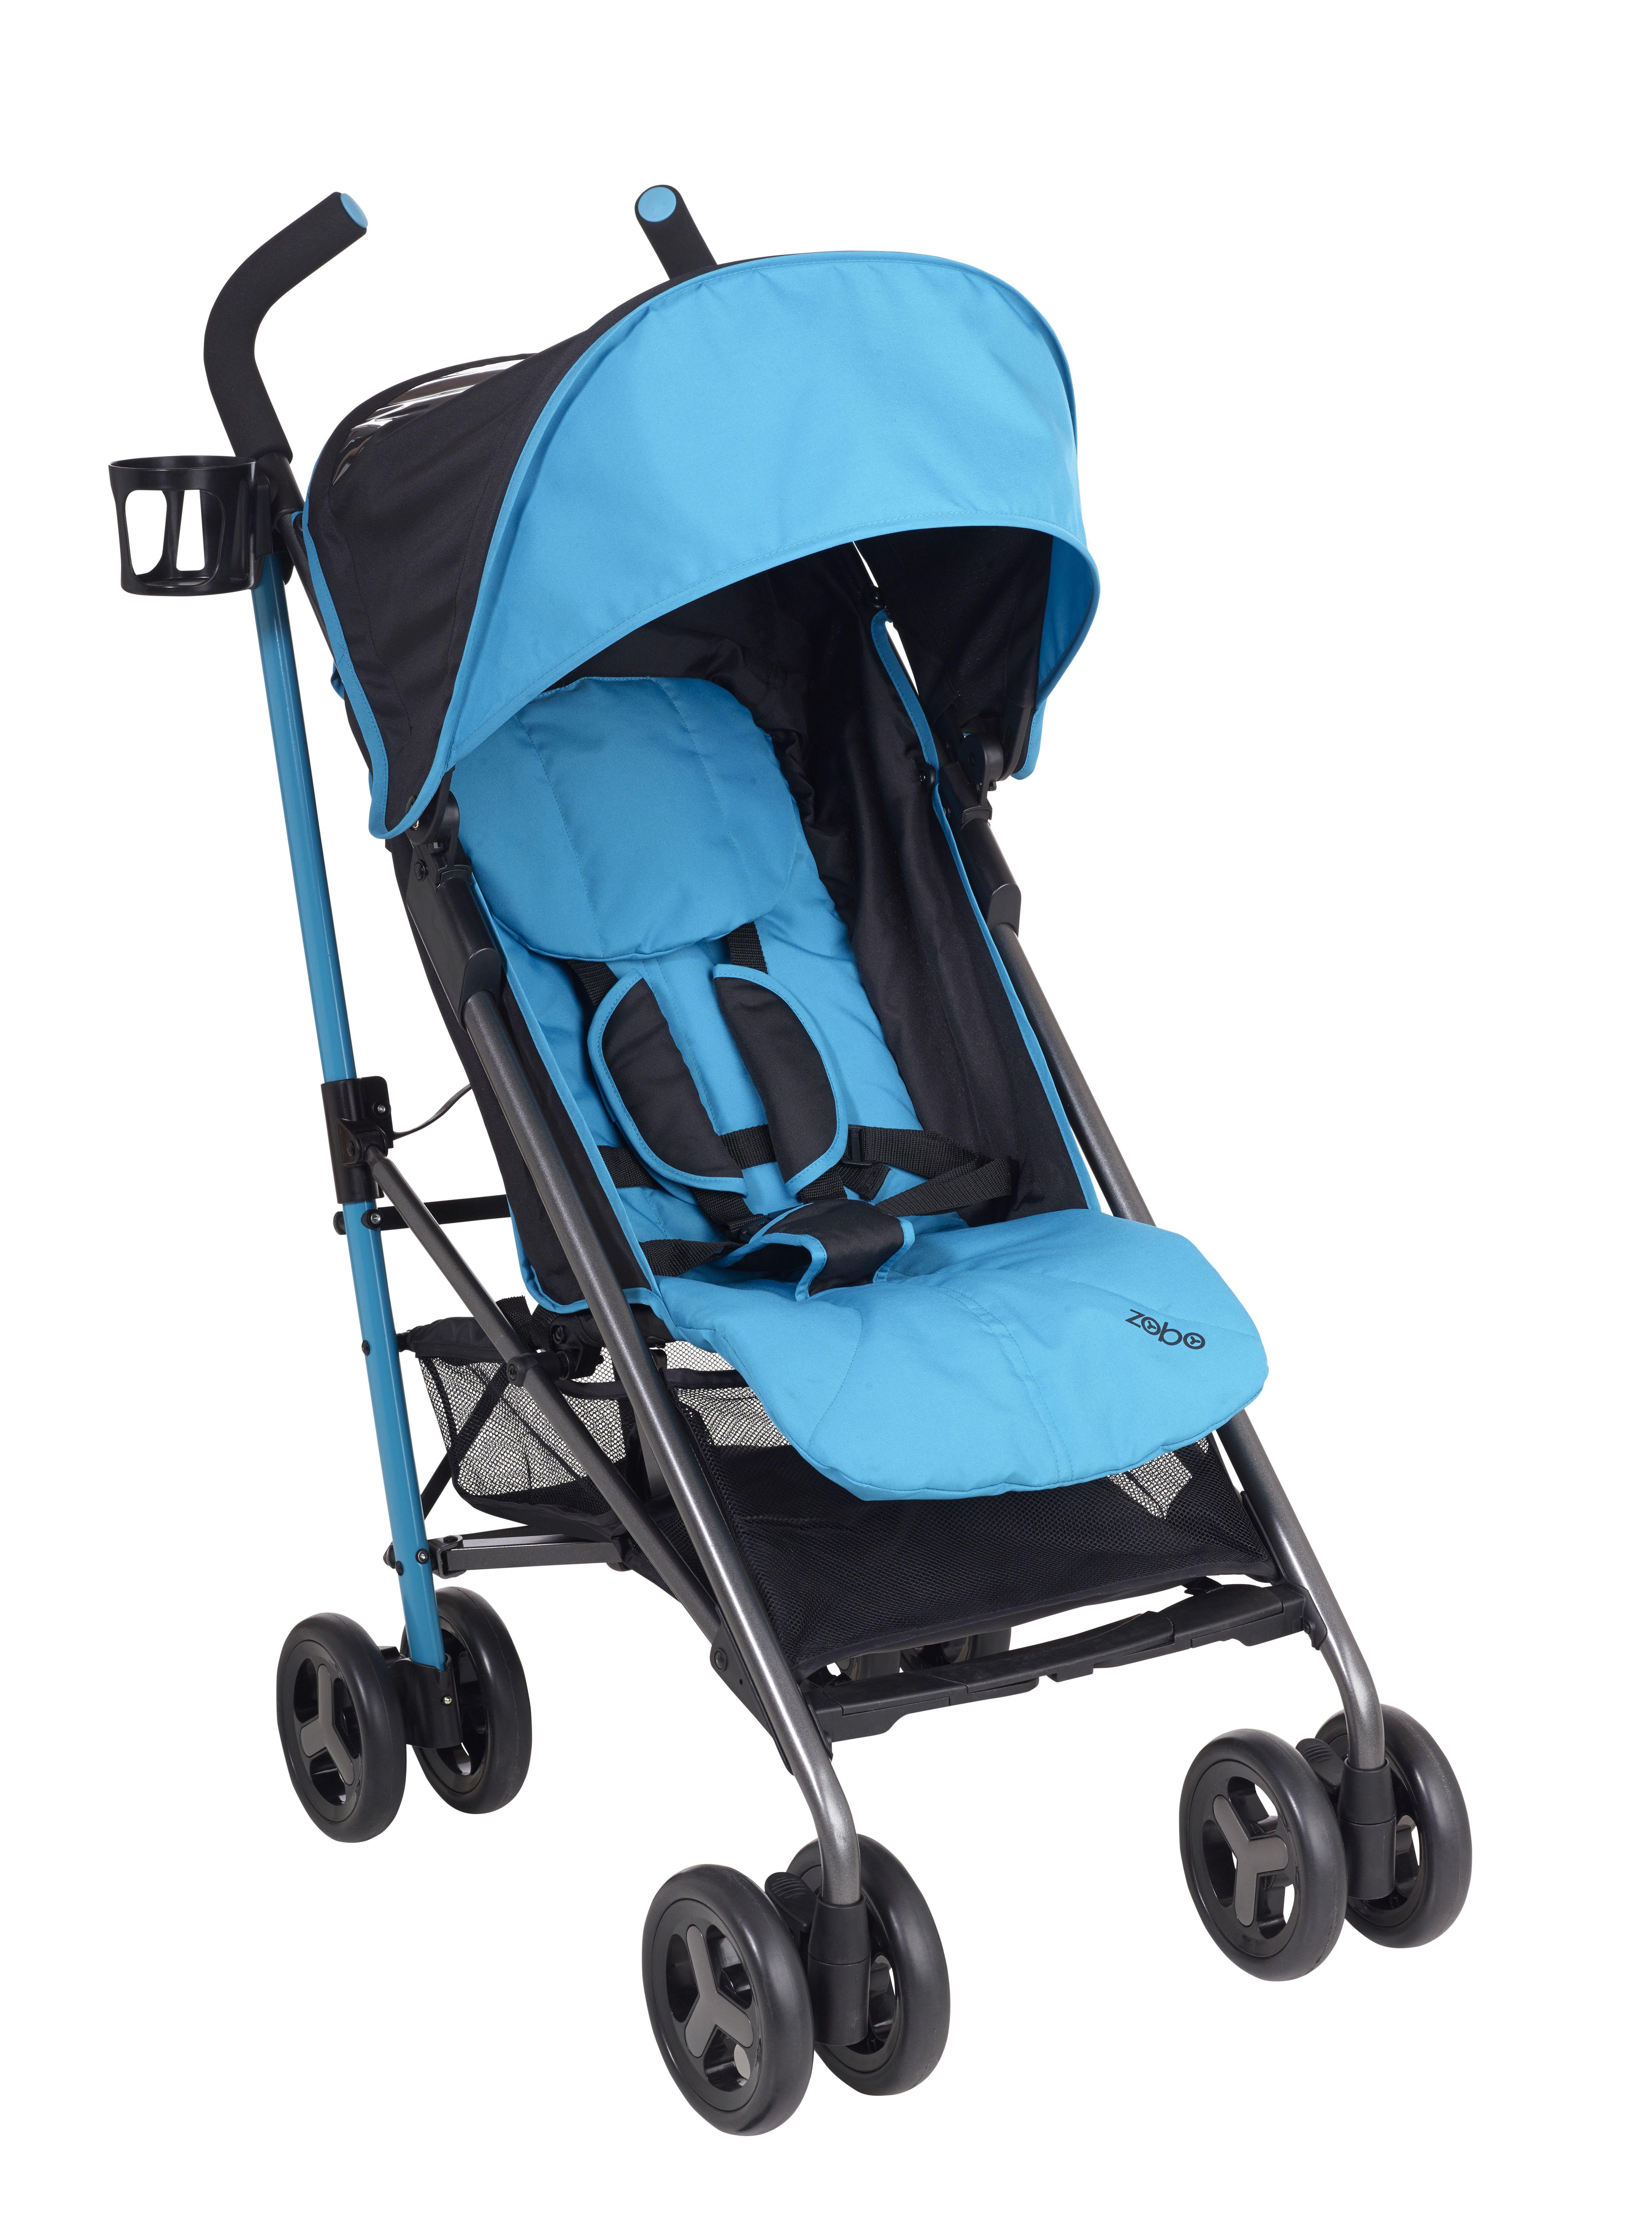 Babies R Us Zobo Double Stroller : babies, double, stroller, Babies, Lightweight, Stroller, Stroller,, Umbrella